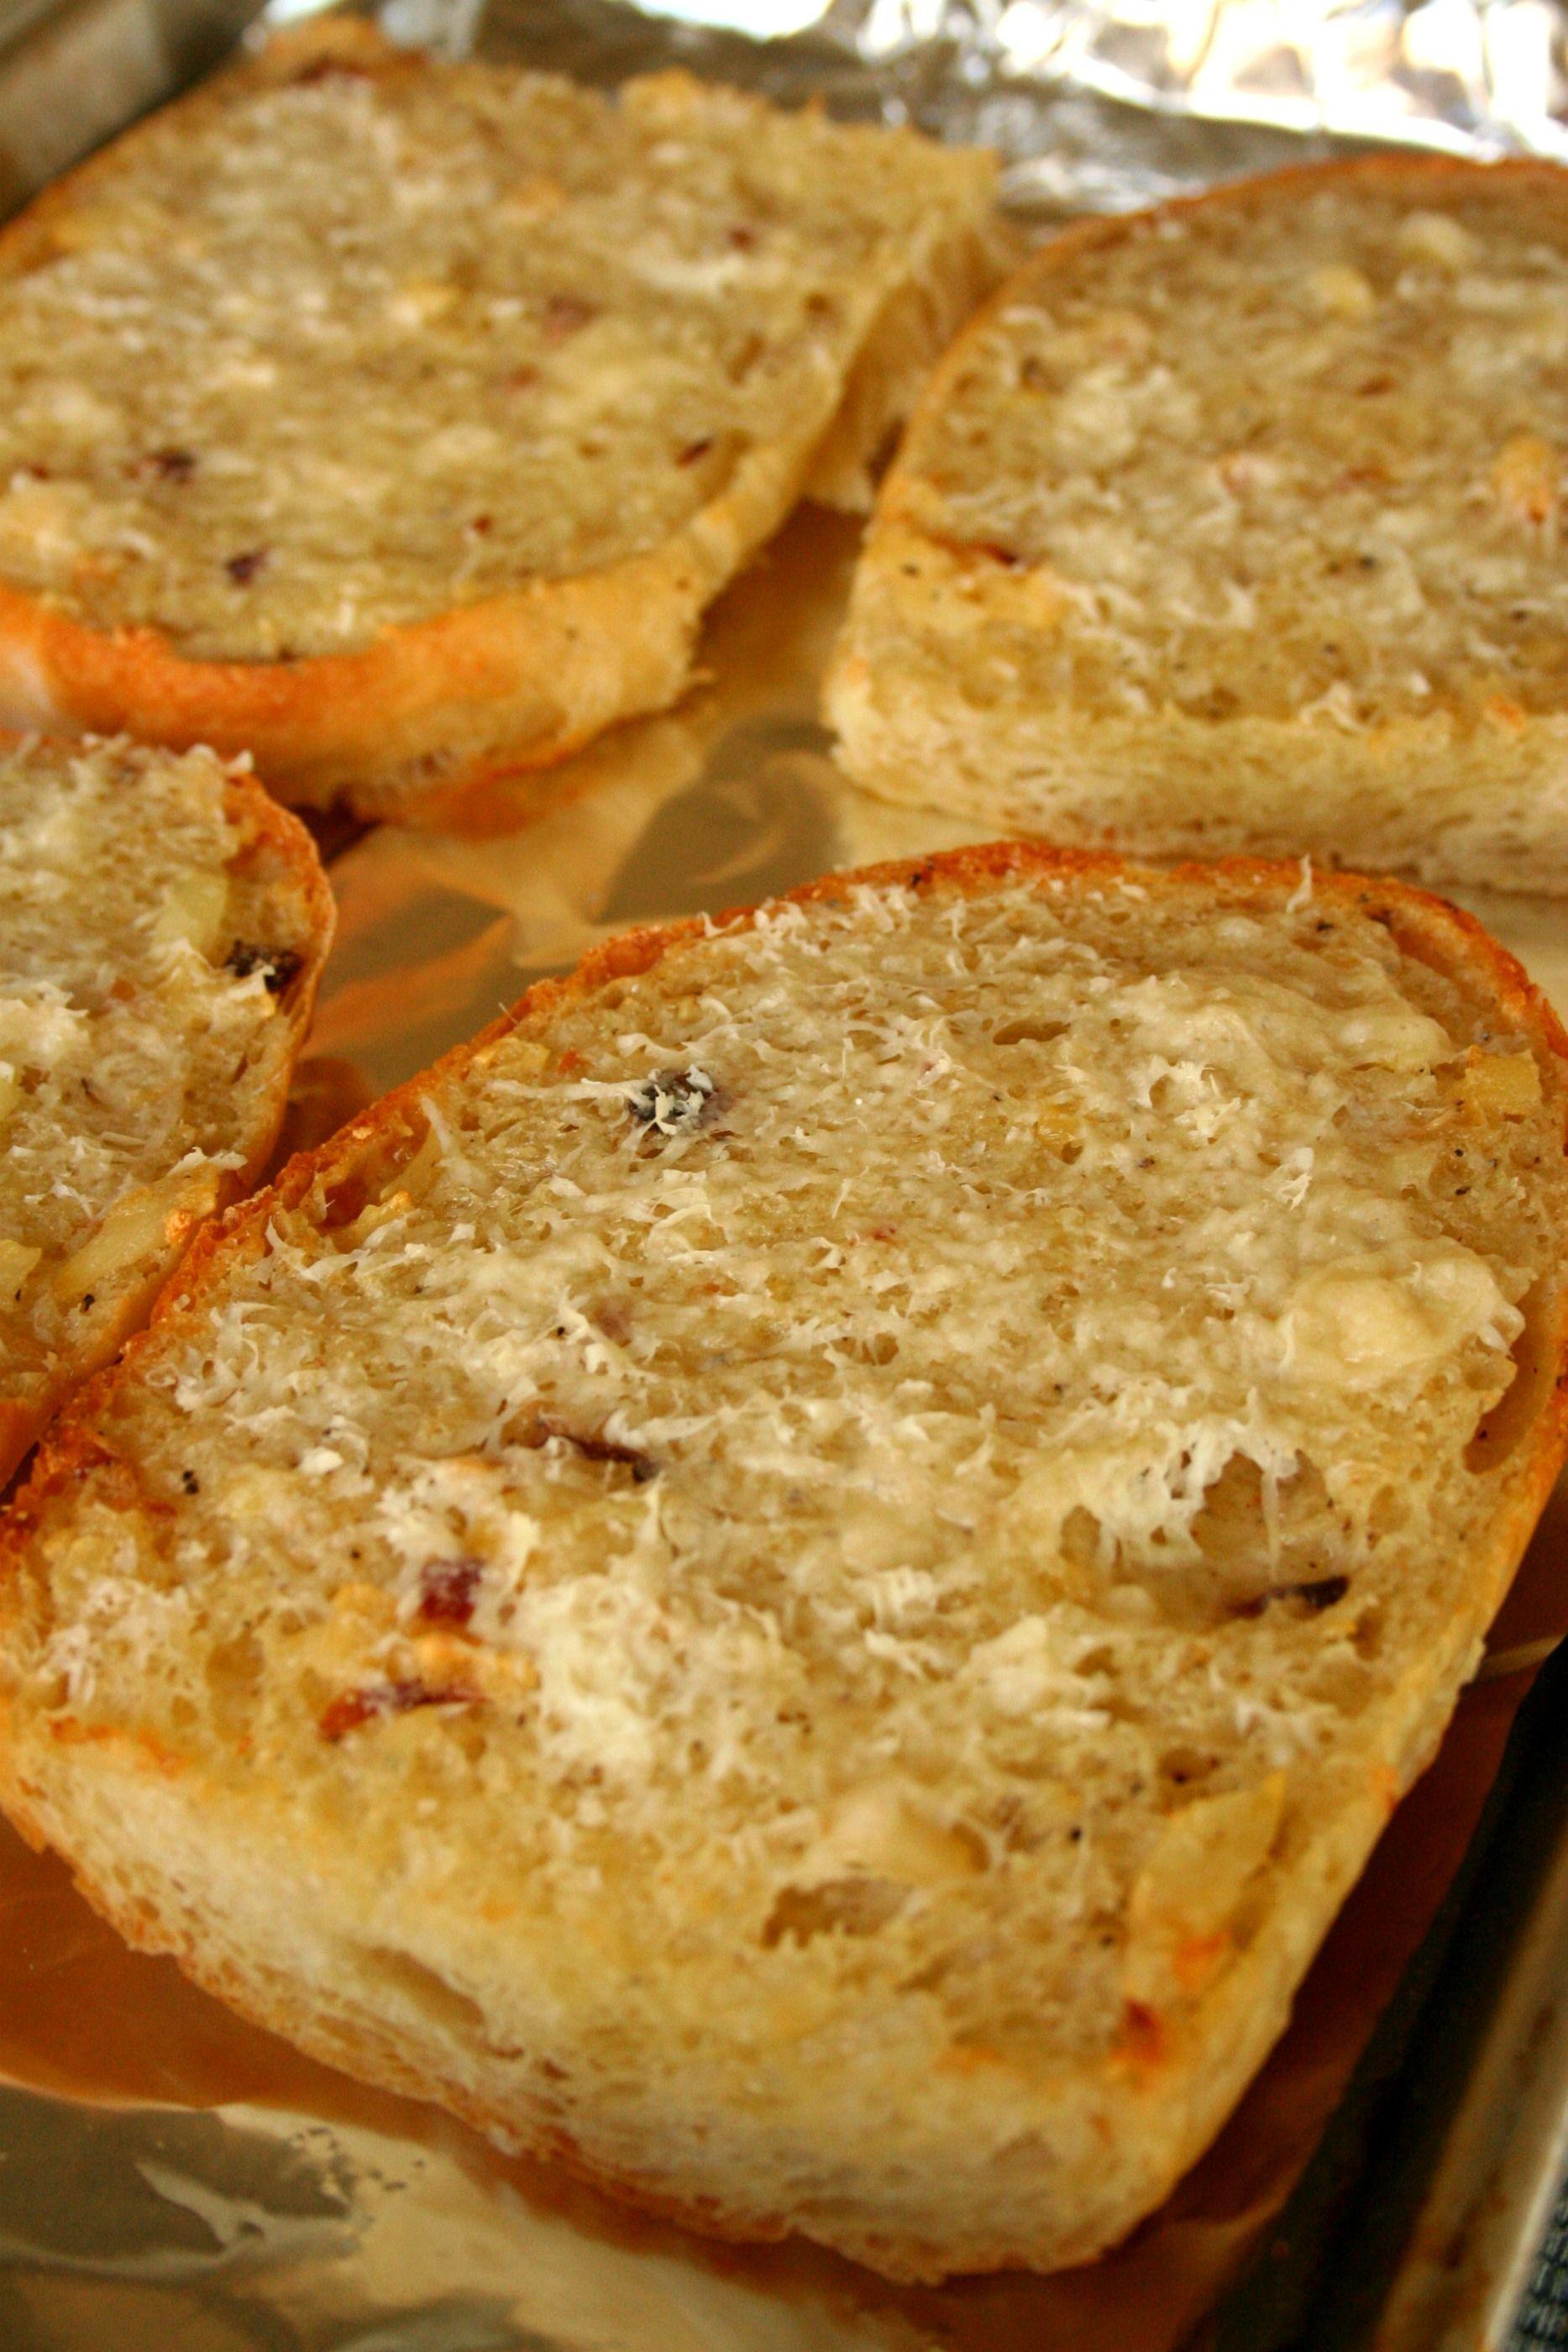 Roasted Garlic Bread | Food recipes, Food, Cooking recipes